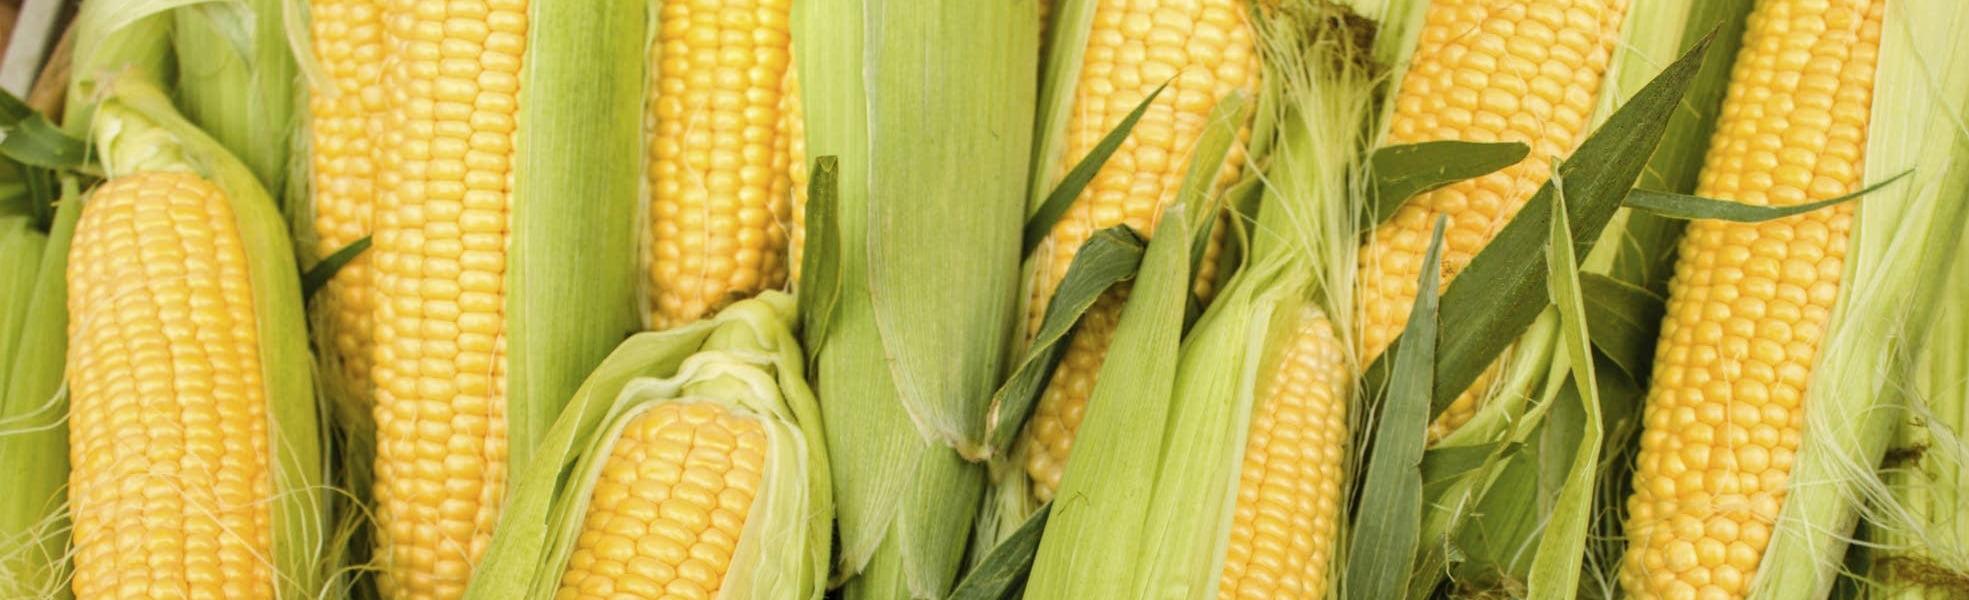 Гумісол 03 Кукурудза допоможе подолати стрес рослини